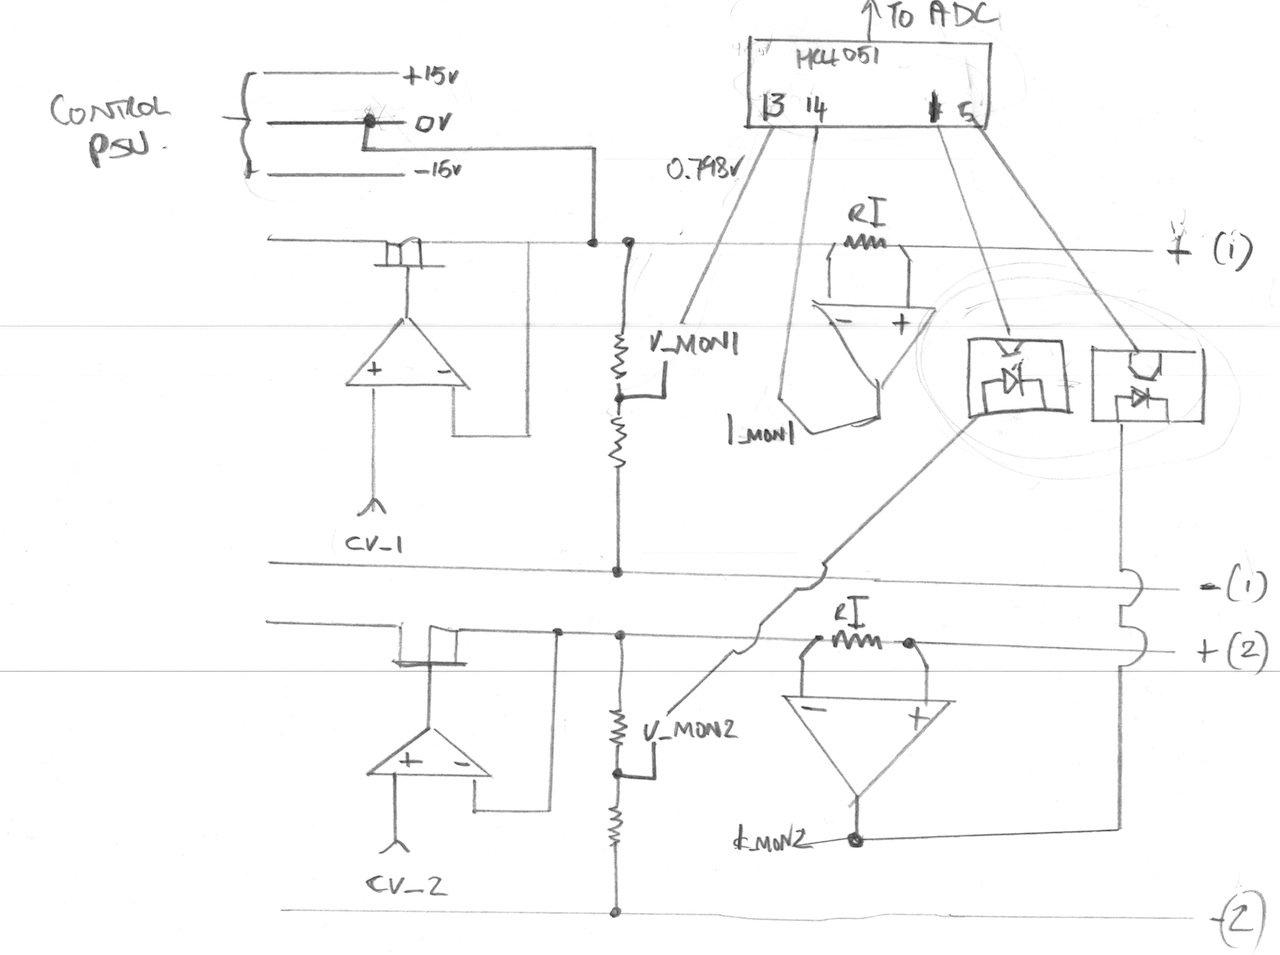 Hp Agilent E3646a Power Supply Teardown Repair The Schematics You Can Download E364xa Service Manual Which Include